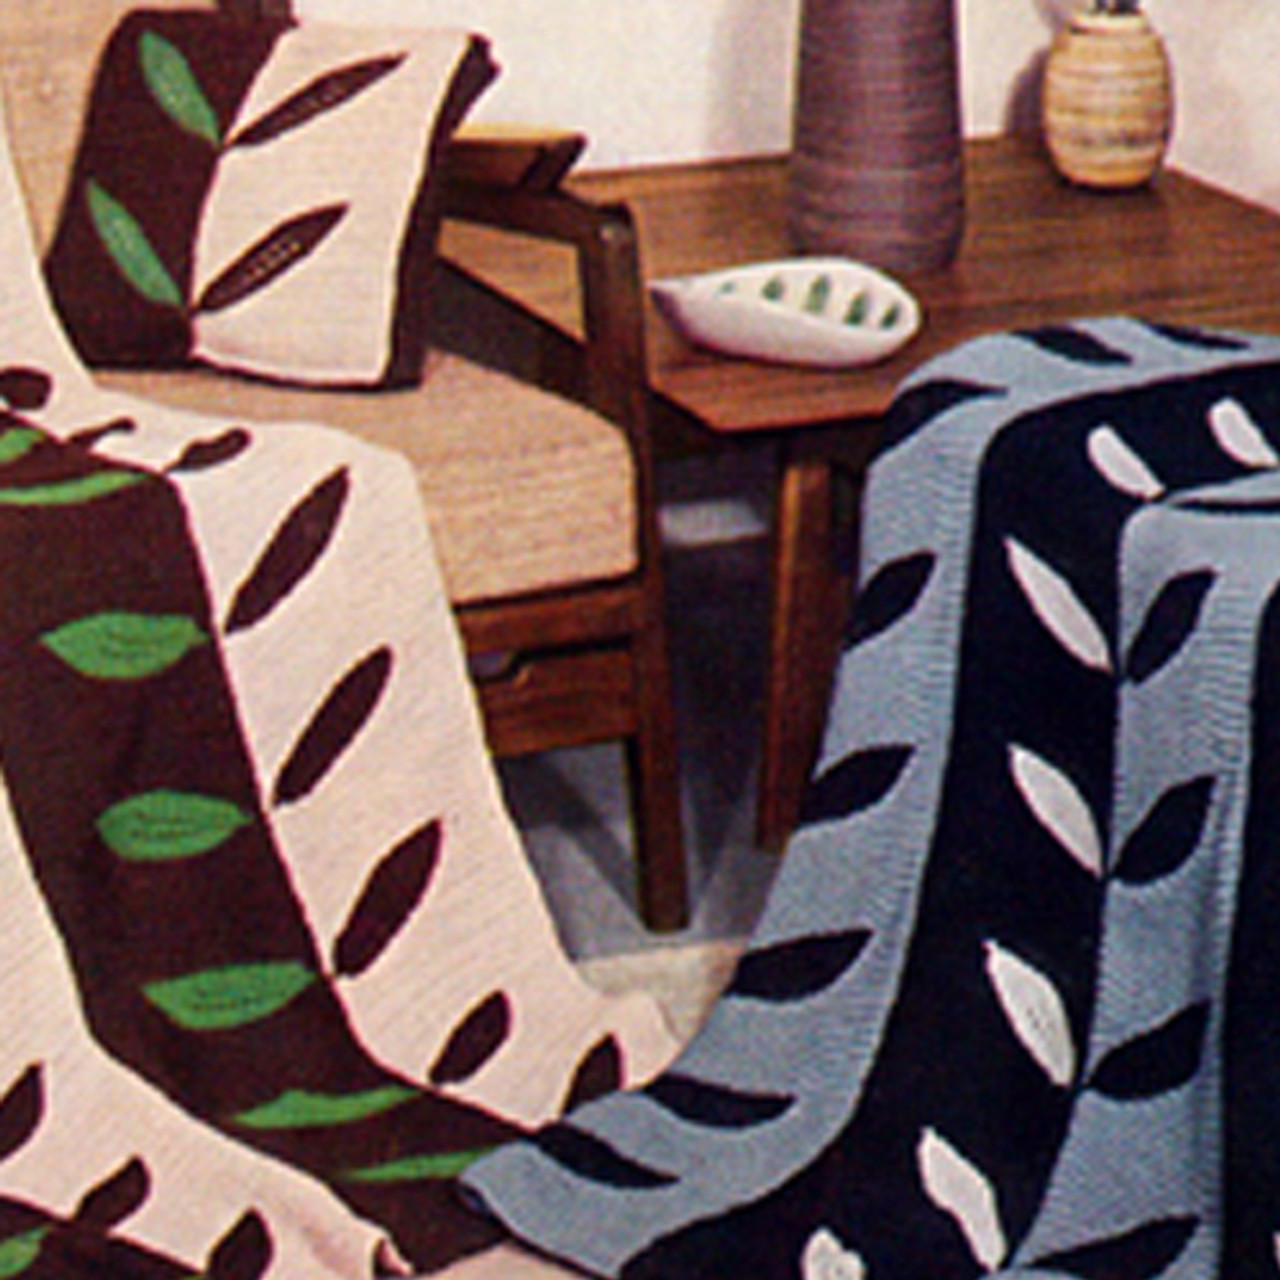 Easy Leaf Crocheted Afghan Pattern in stripes